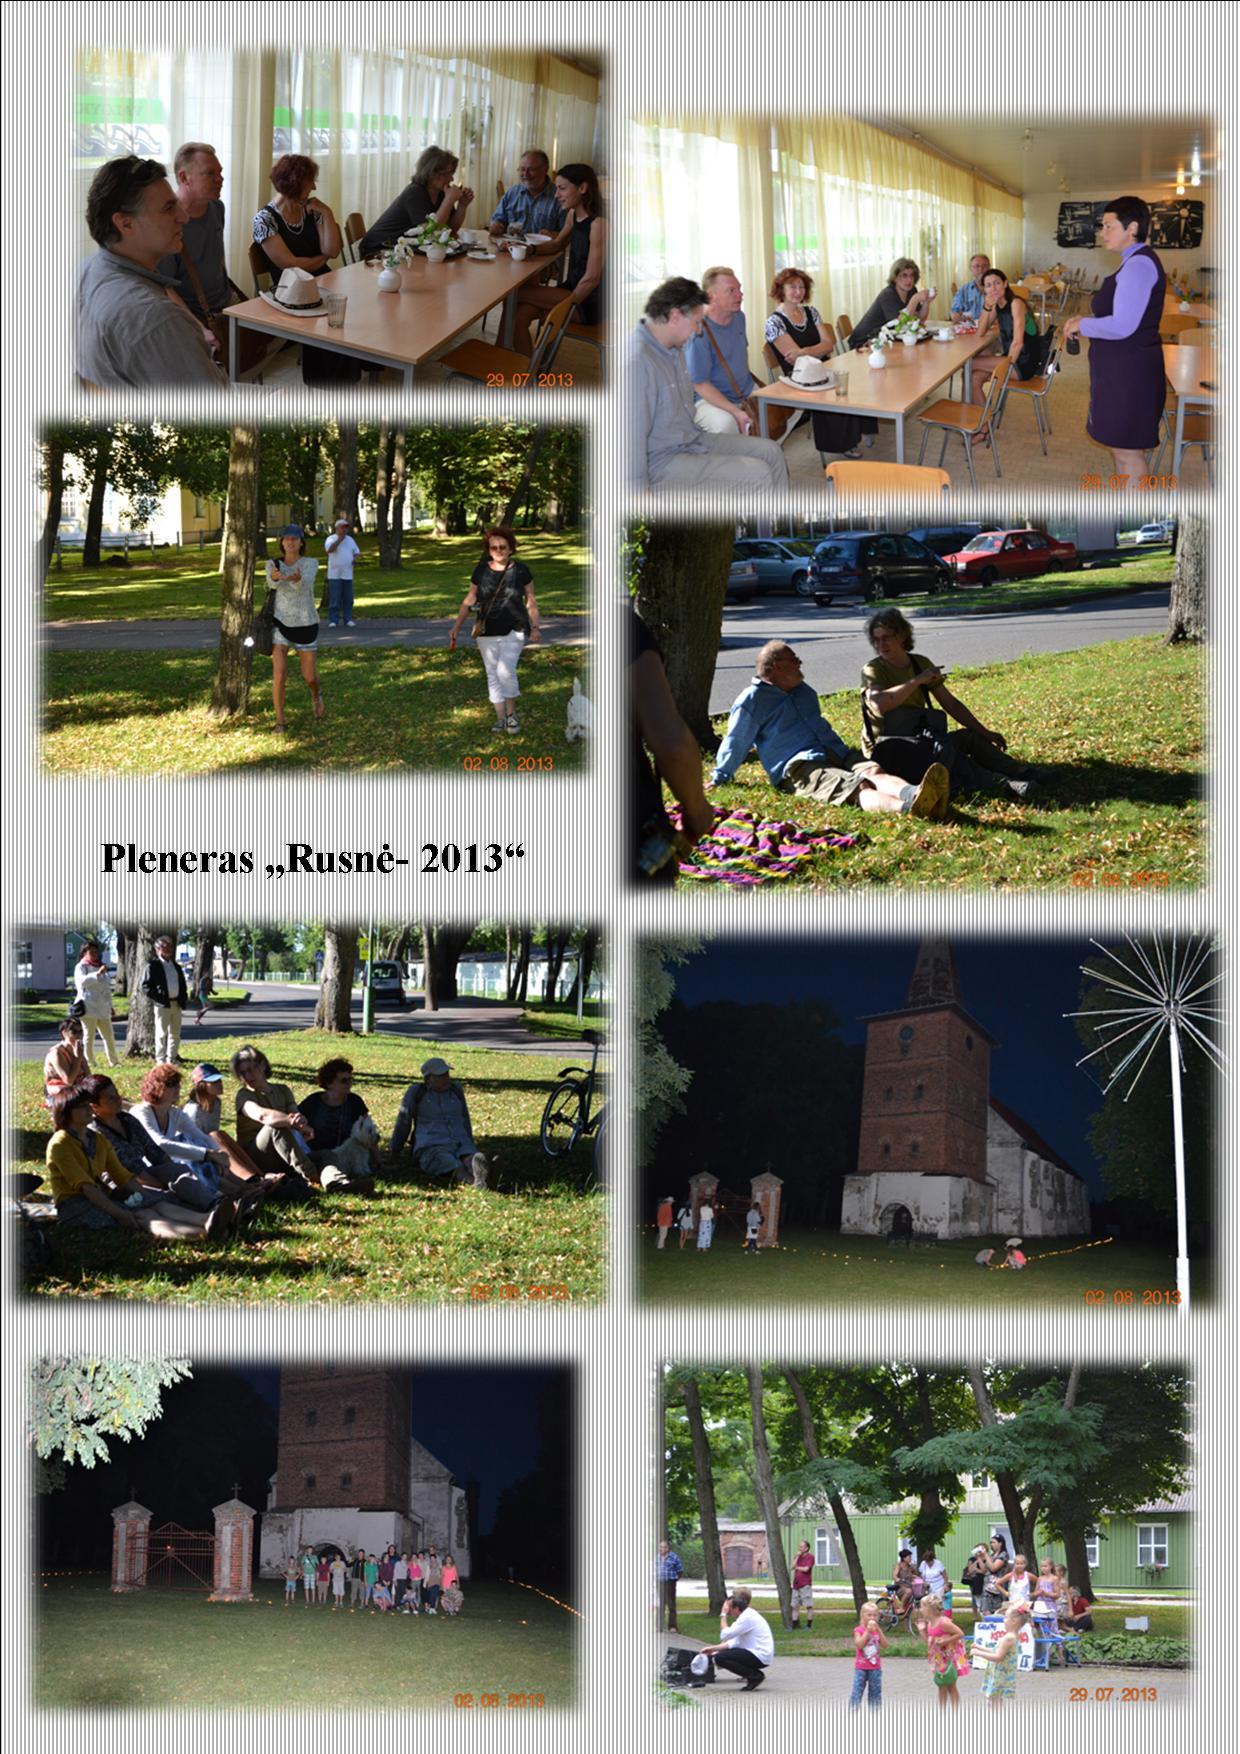 2013 m pleneras nuotraukose